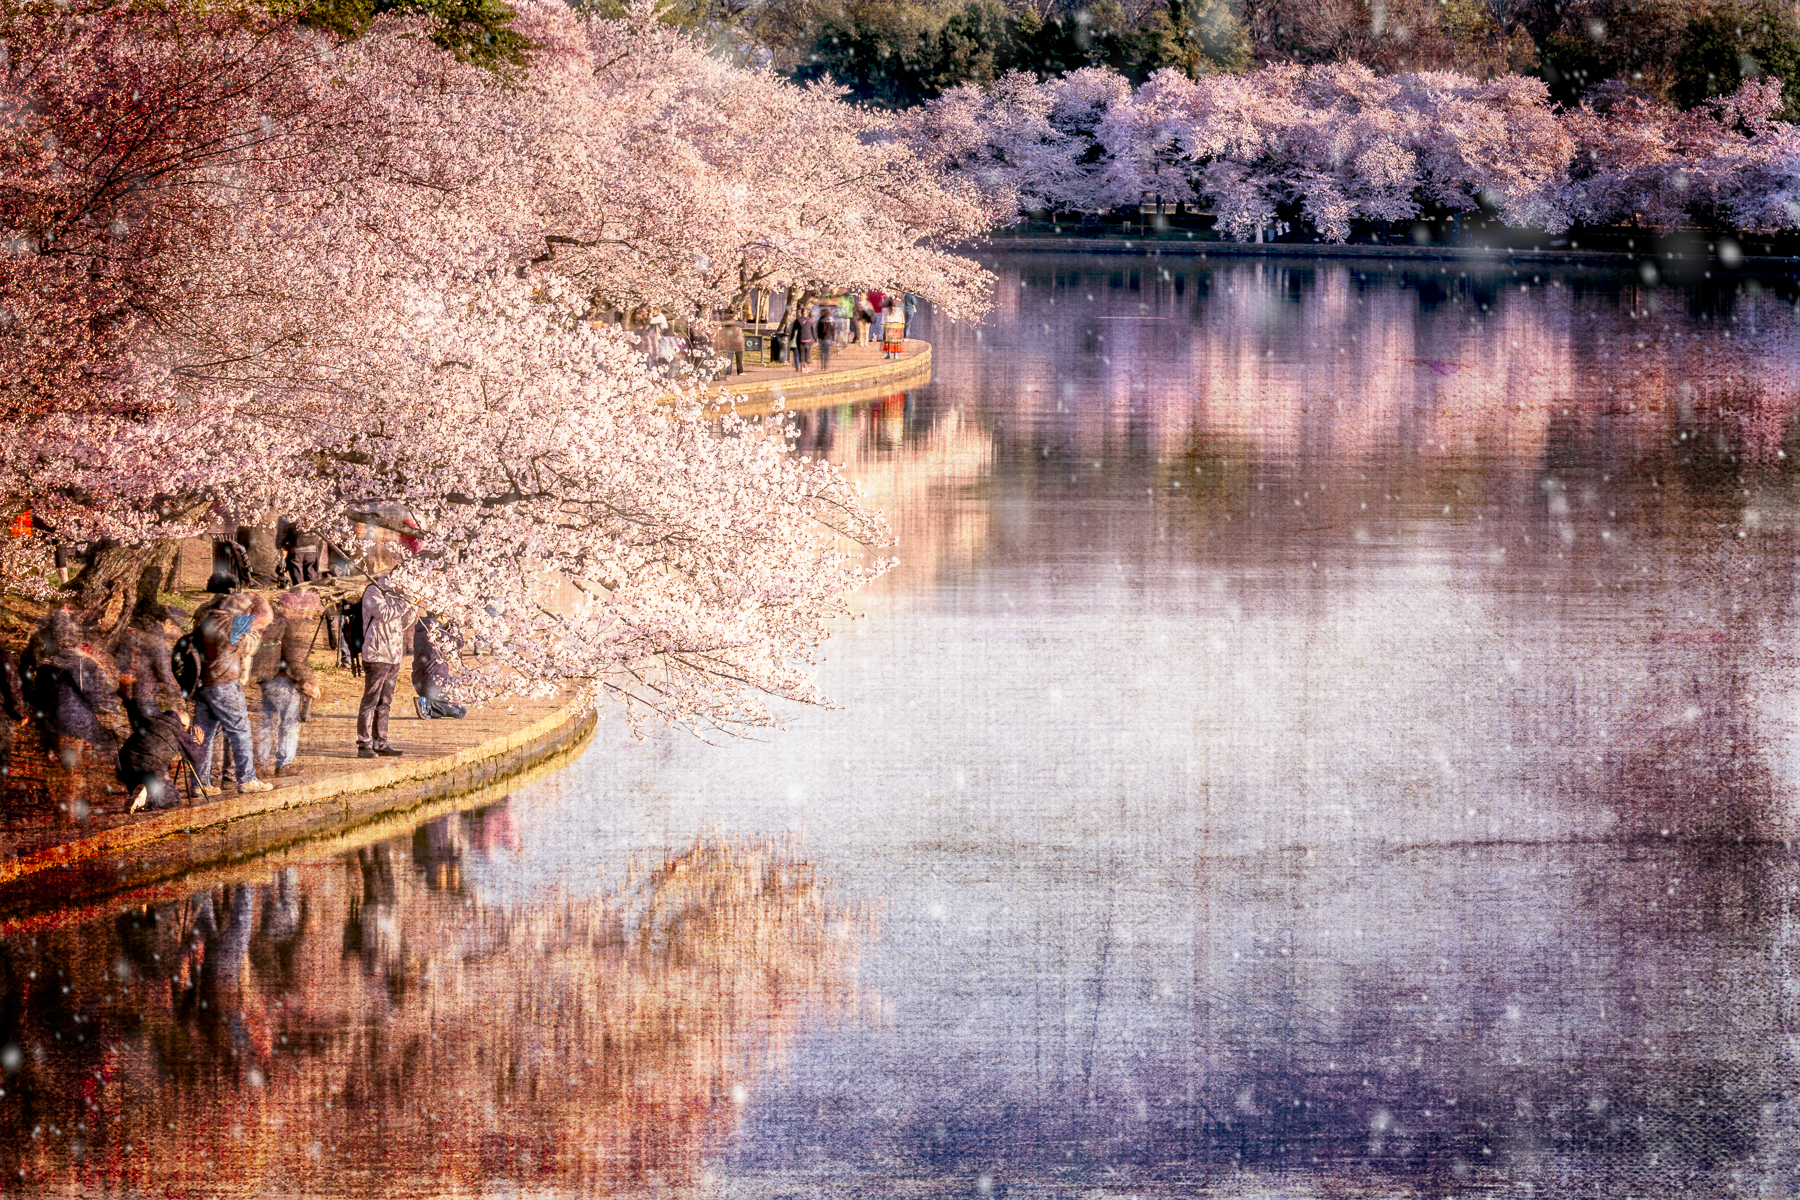 Sandy_Adams_Cherry_Blossom_Season_Magical-4.jpg